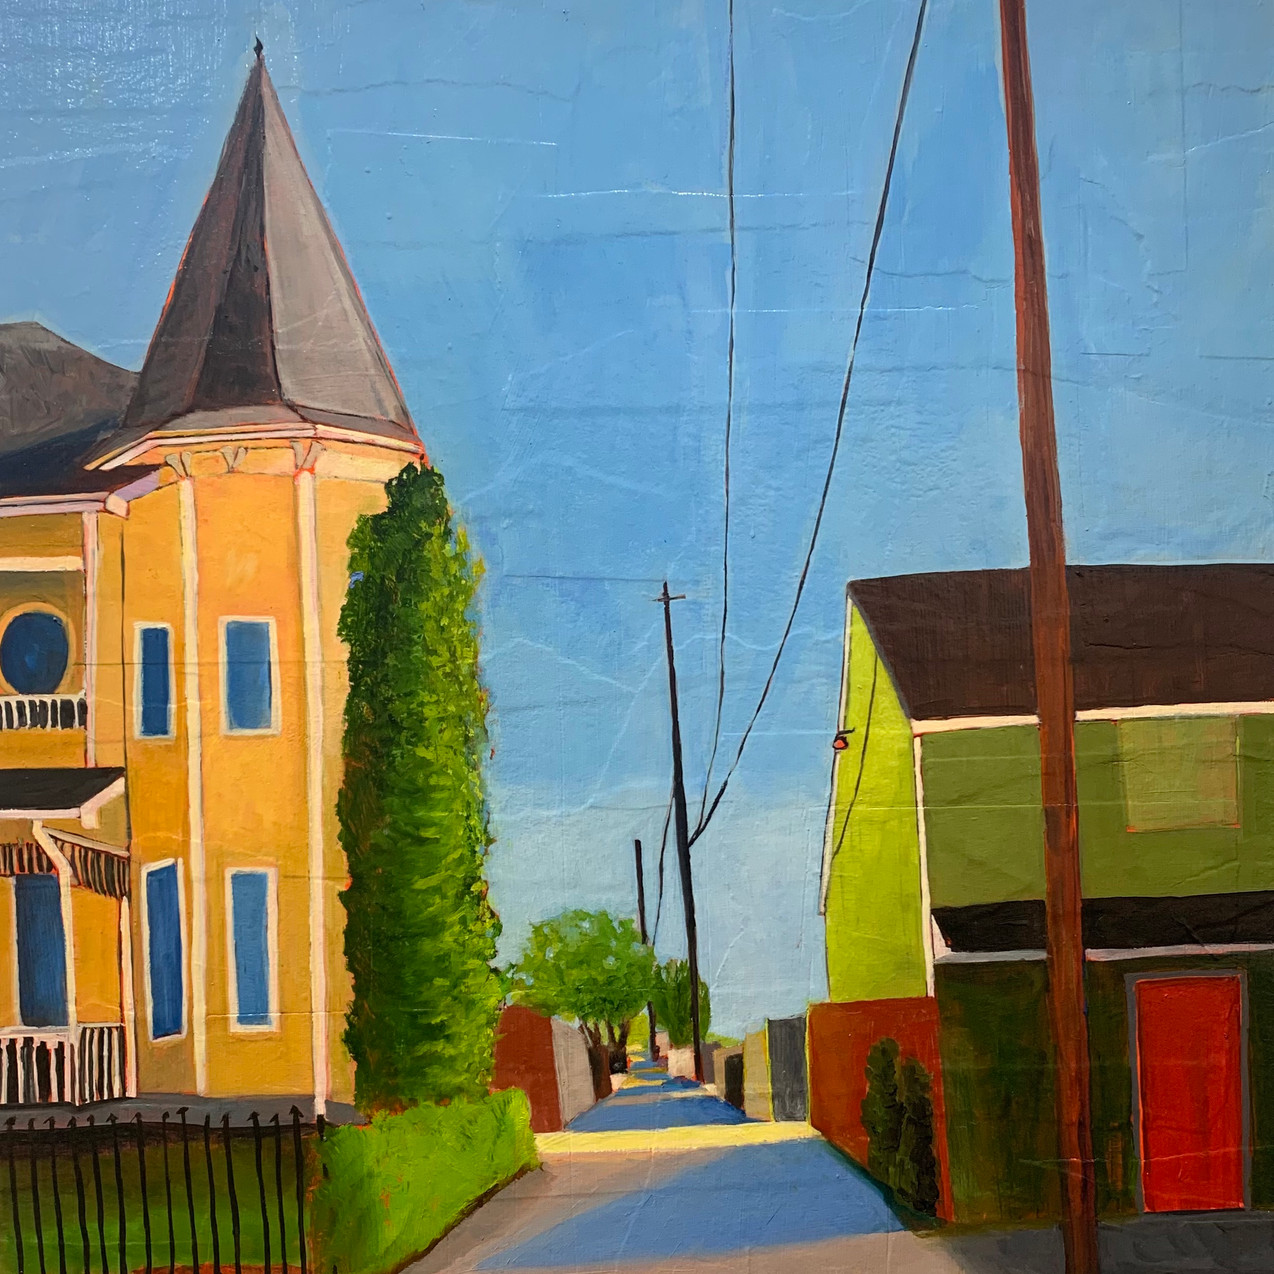 Arlington Street, Heights. 24x18. Oil on collaged canvas.